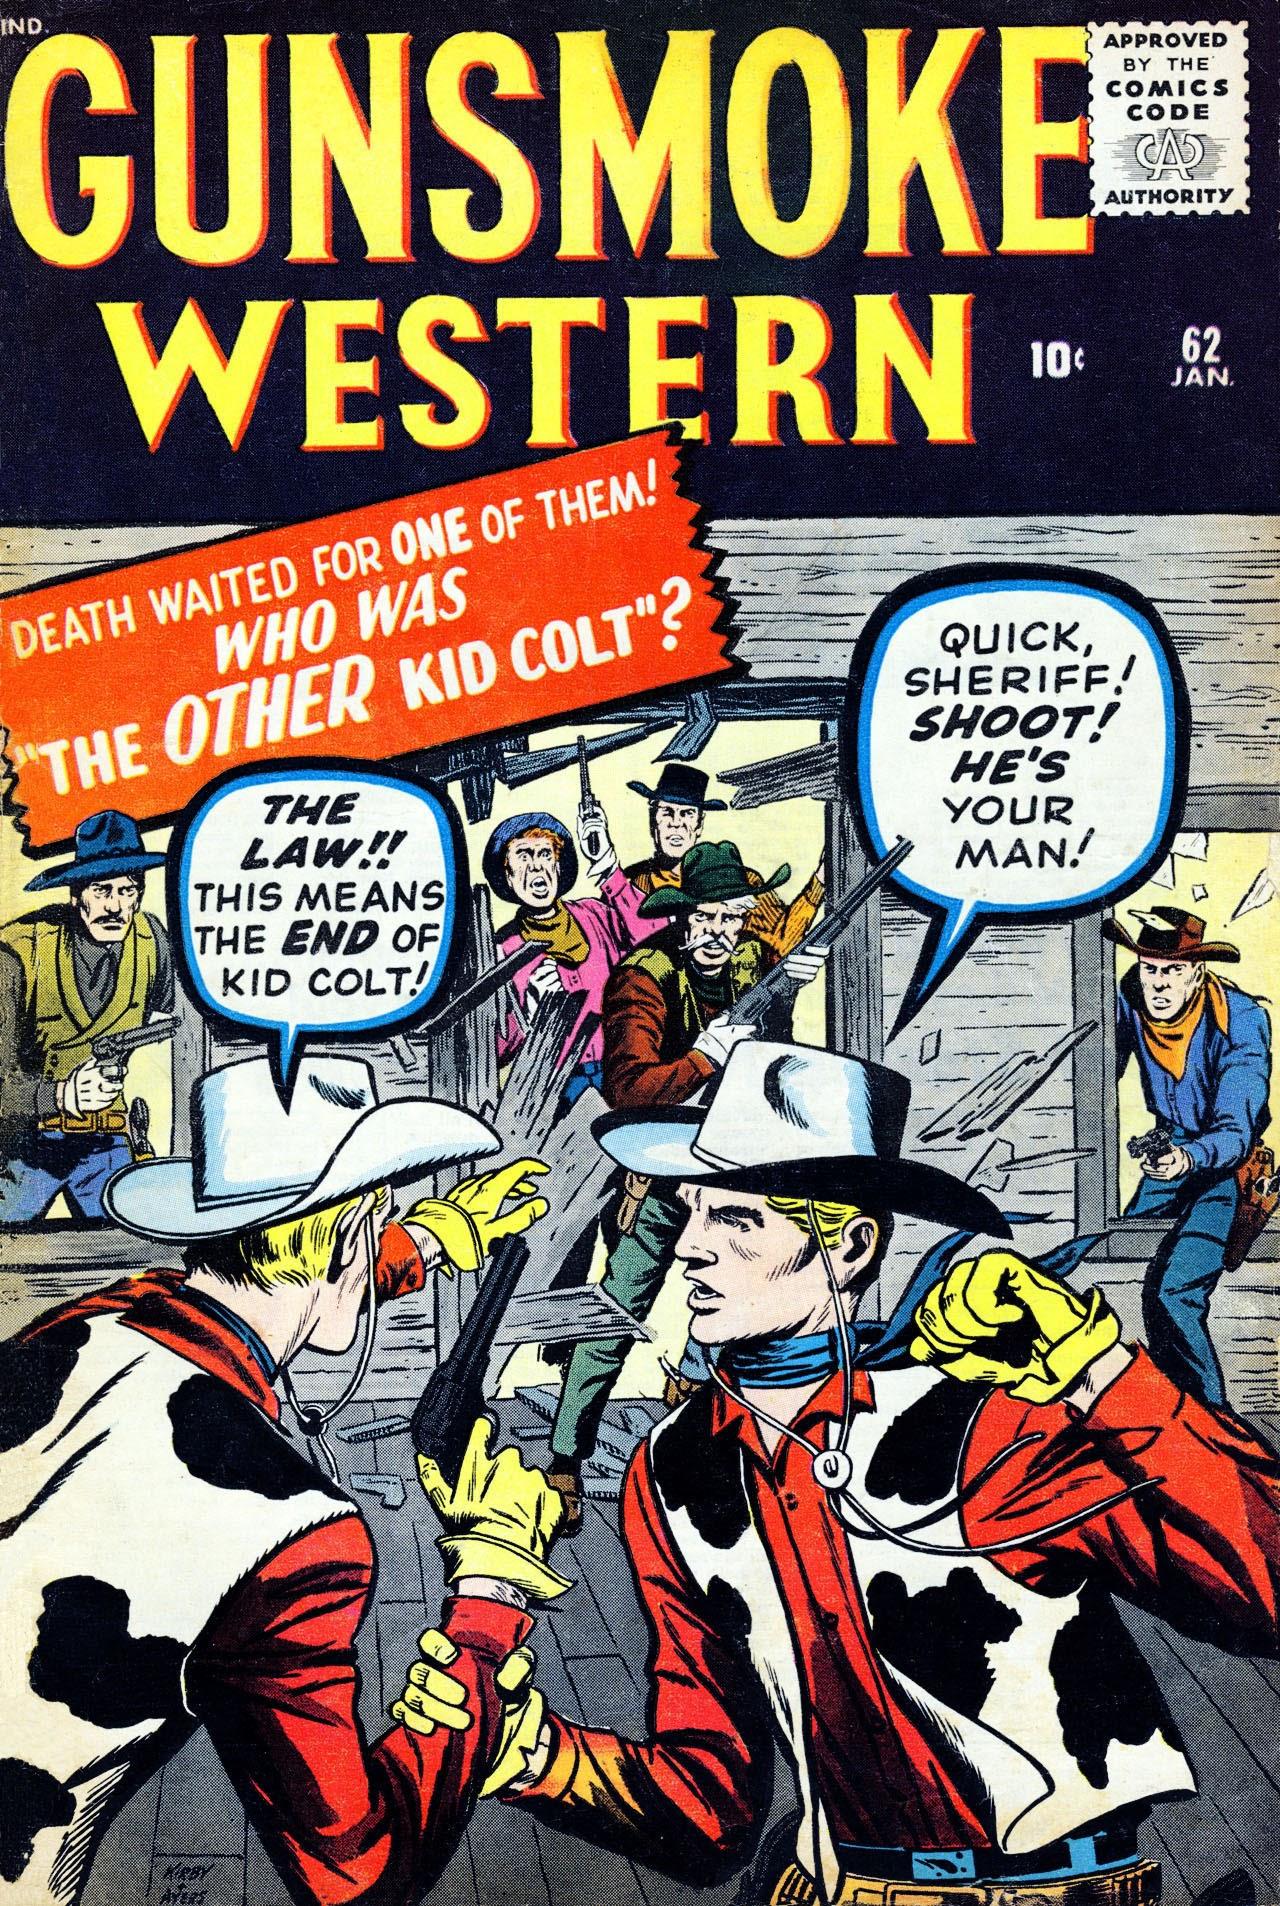 Gunsmoke Western 62 Page 1